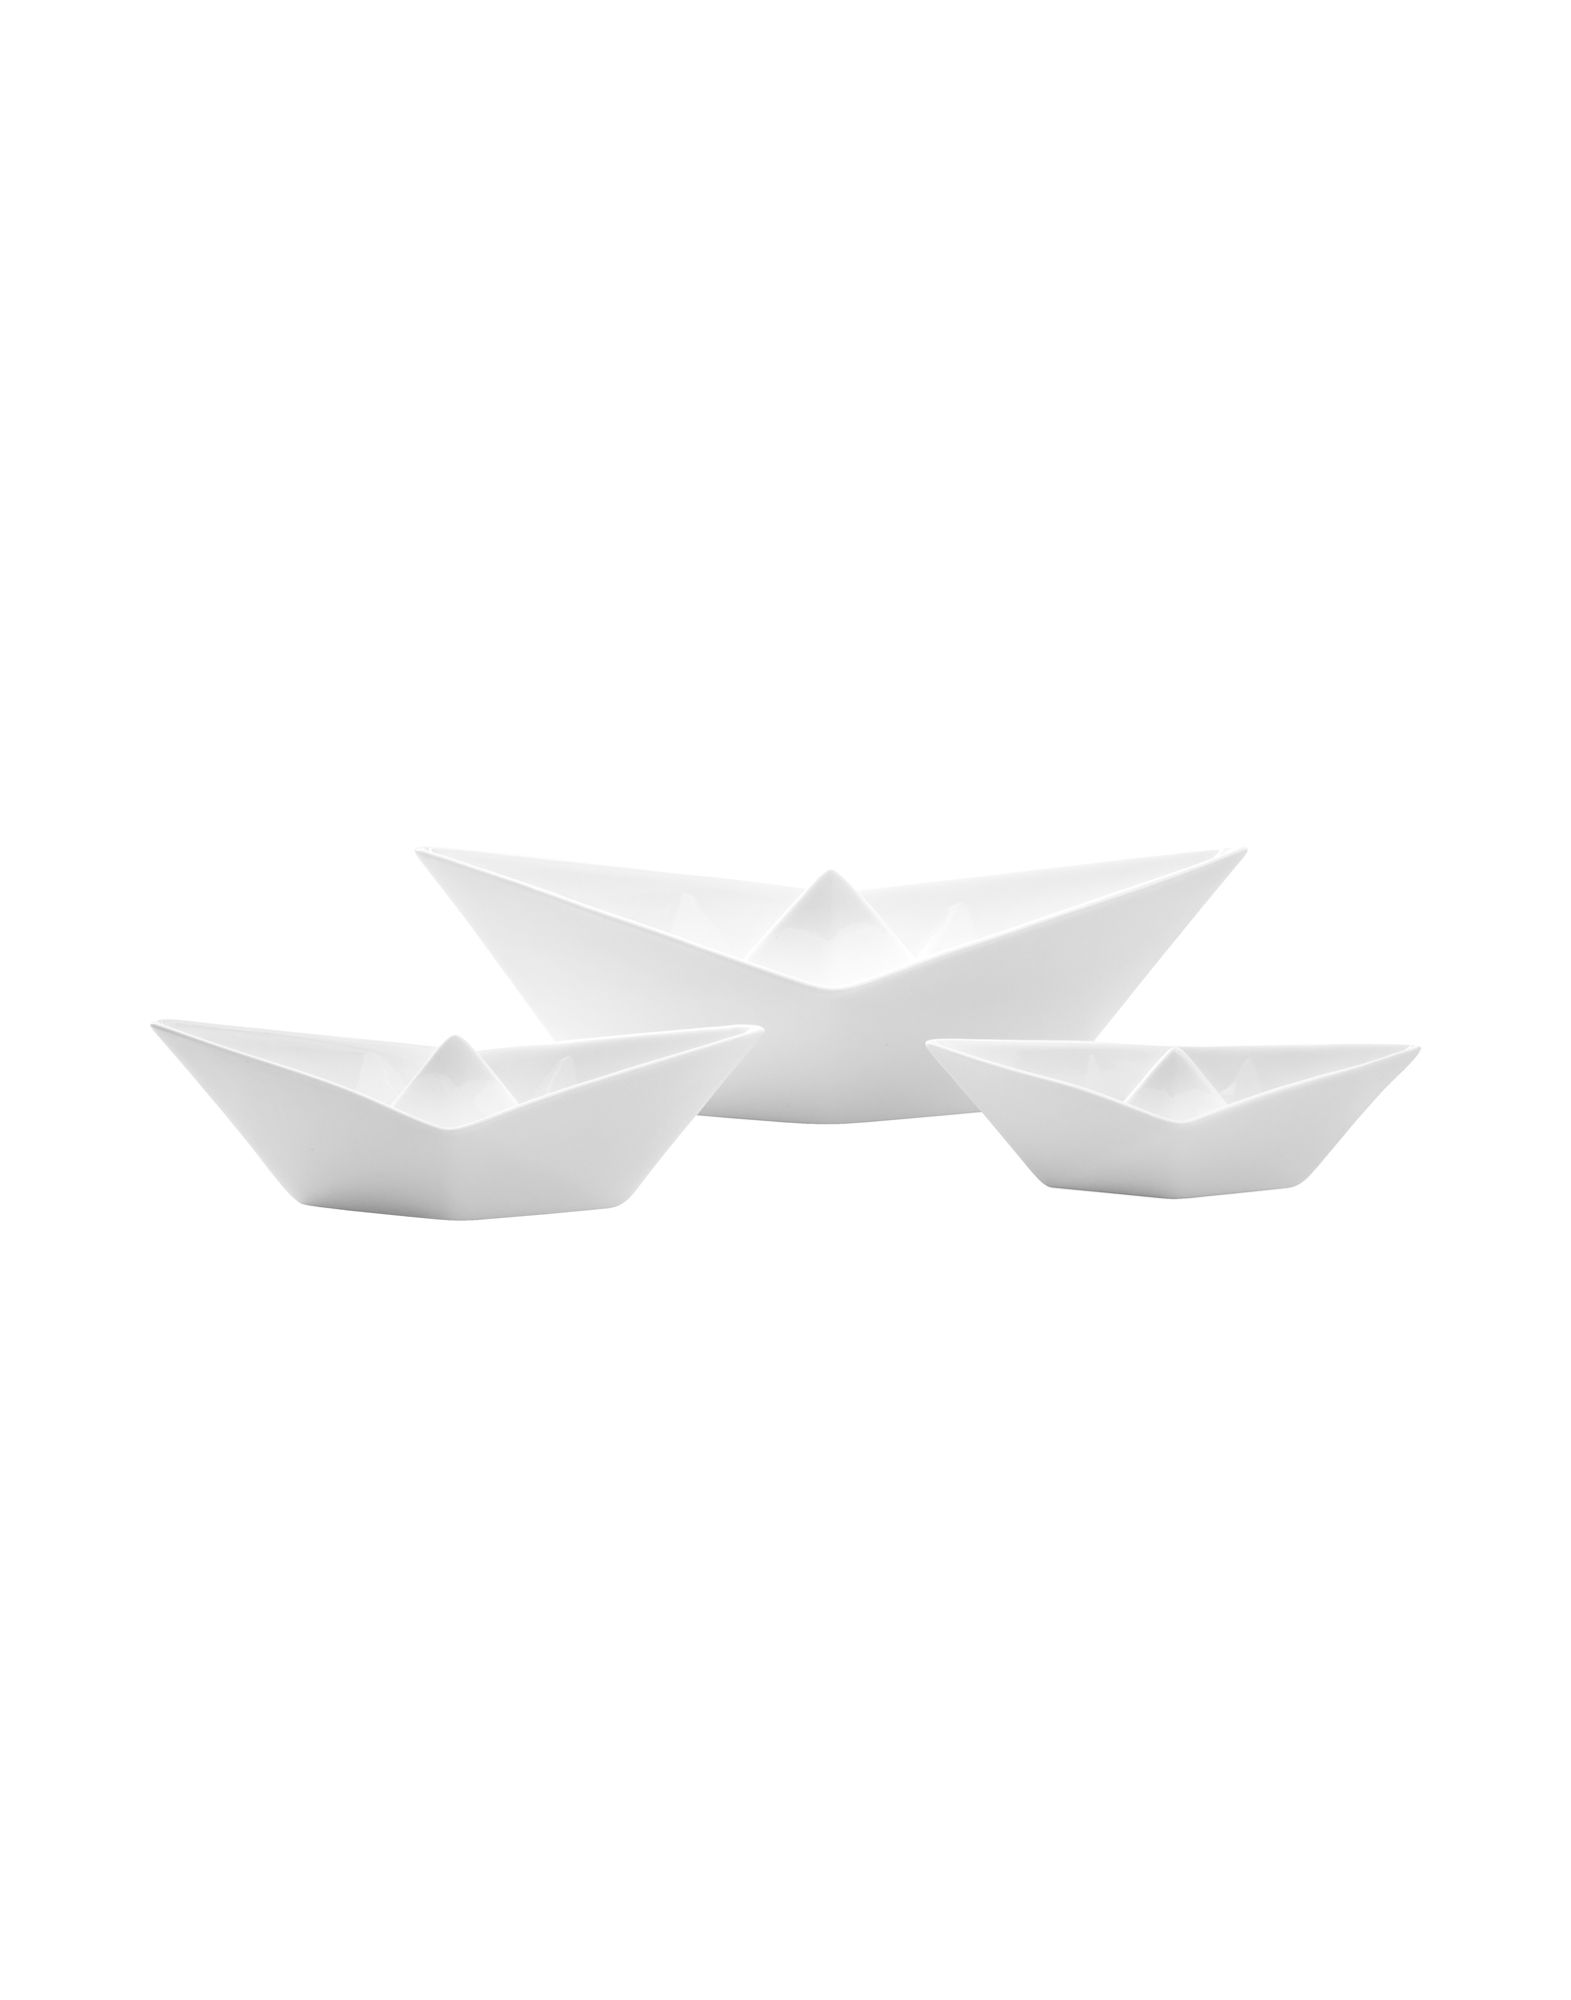 YOOX.COM(ユークス)《セール開催中》SELETTI Unisex 雑貨 ホワイト セラミック Memorabilia